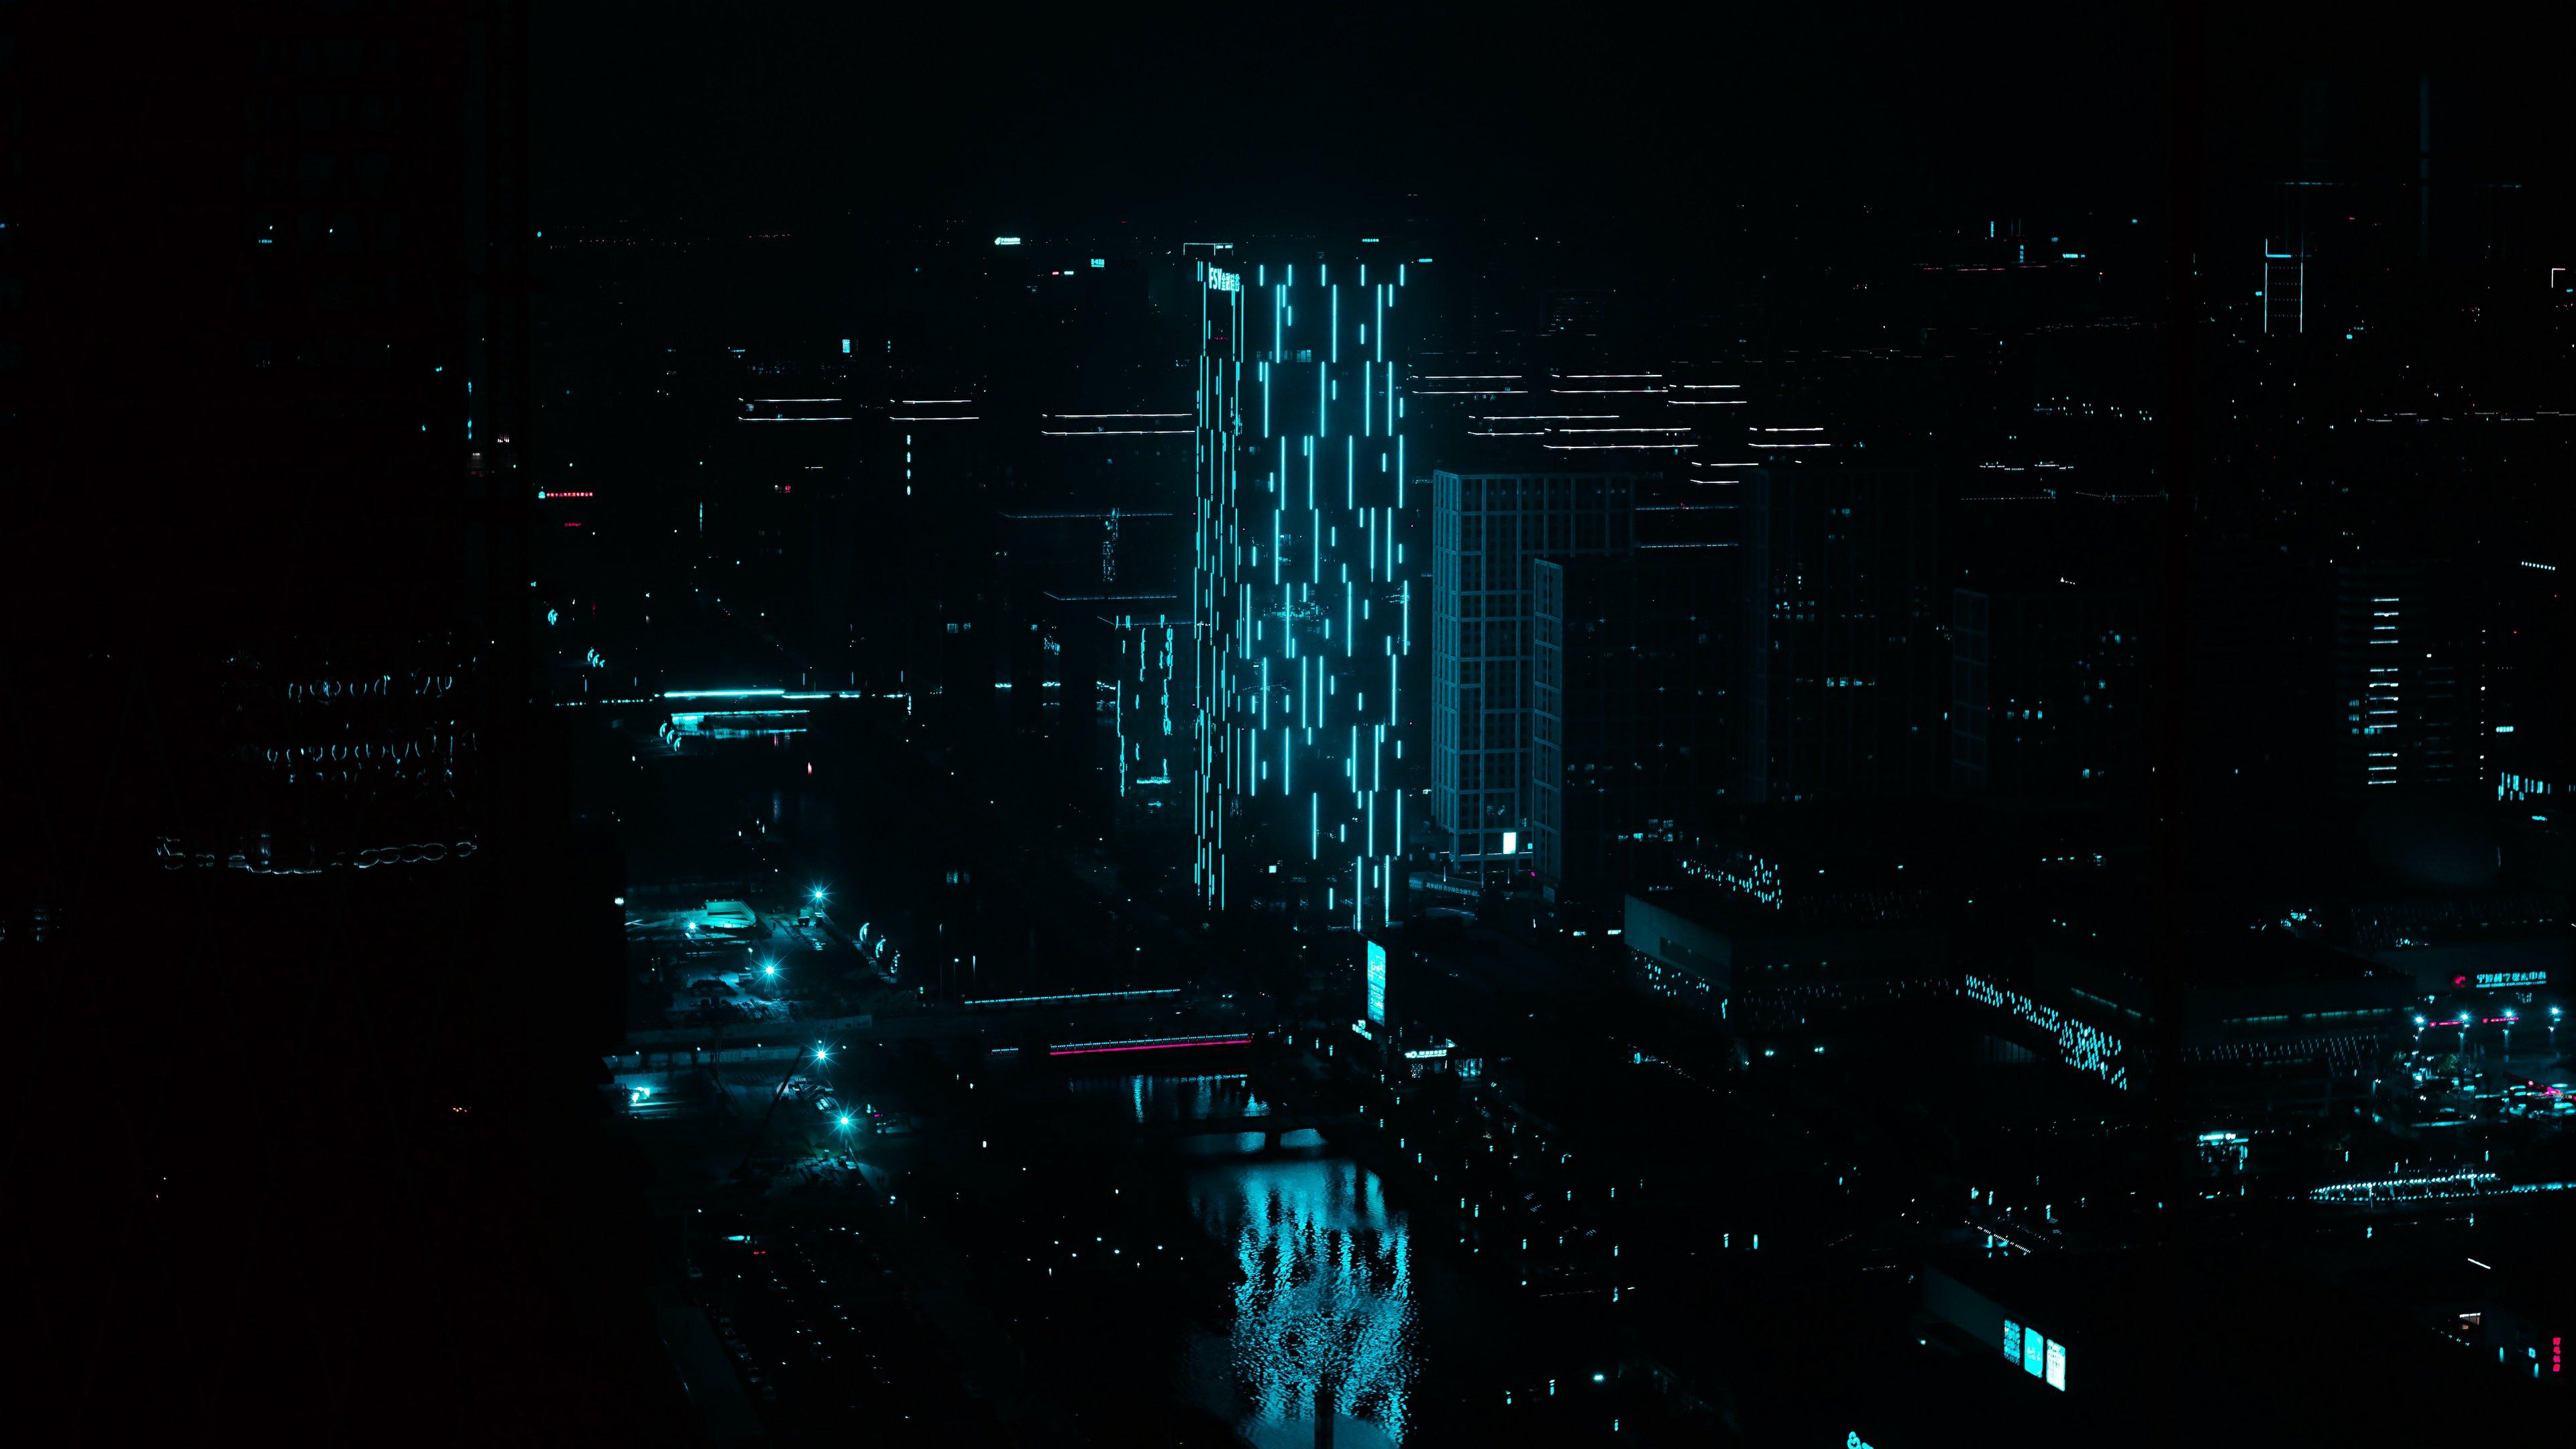 Fondos de pantalla Edificios en Ciudad de noche con iluminación neón azul